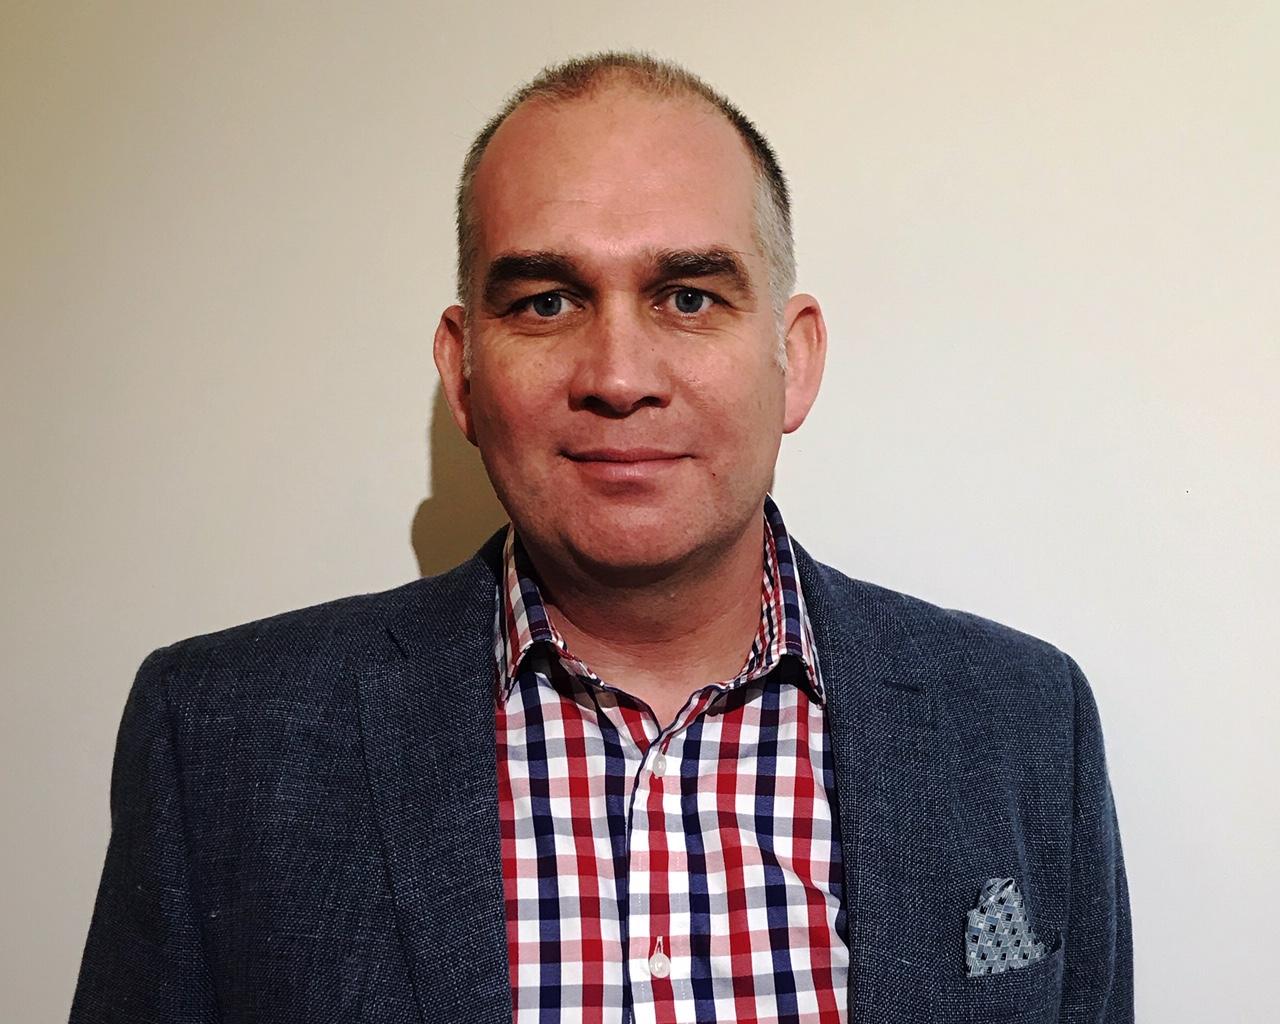 CTO Talk: Q&A with Boomi's CTO Mike Kiersey